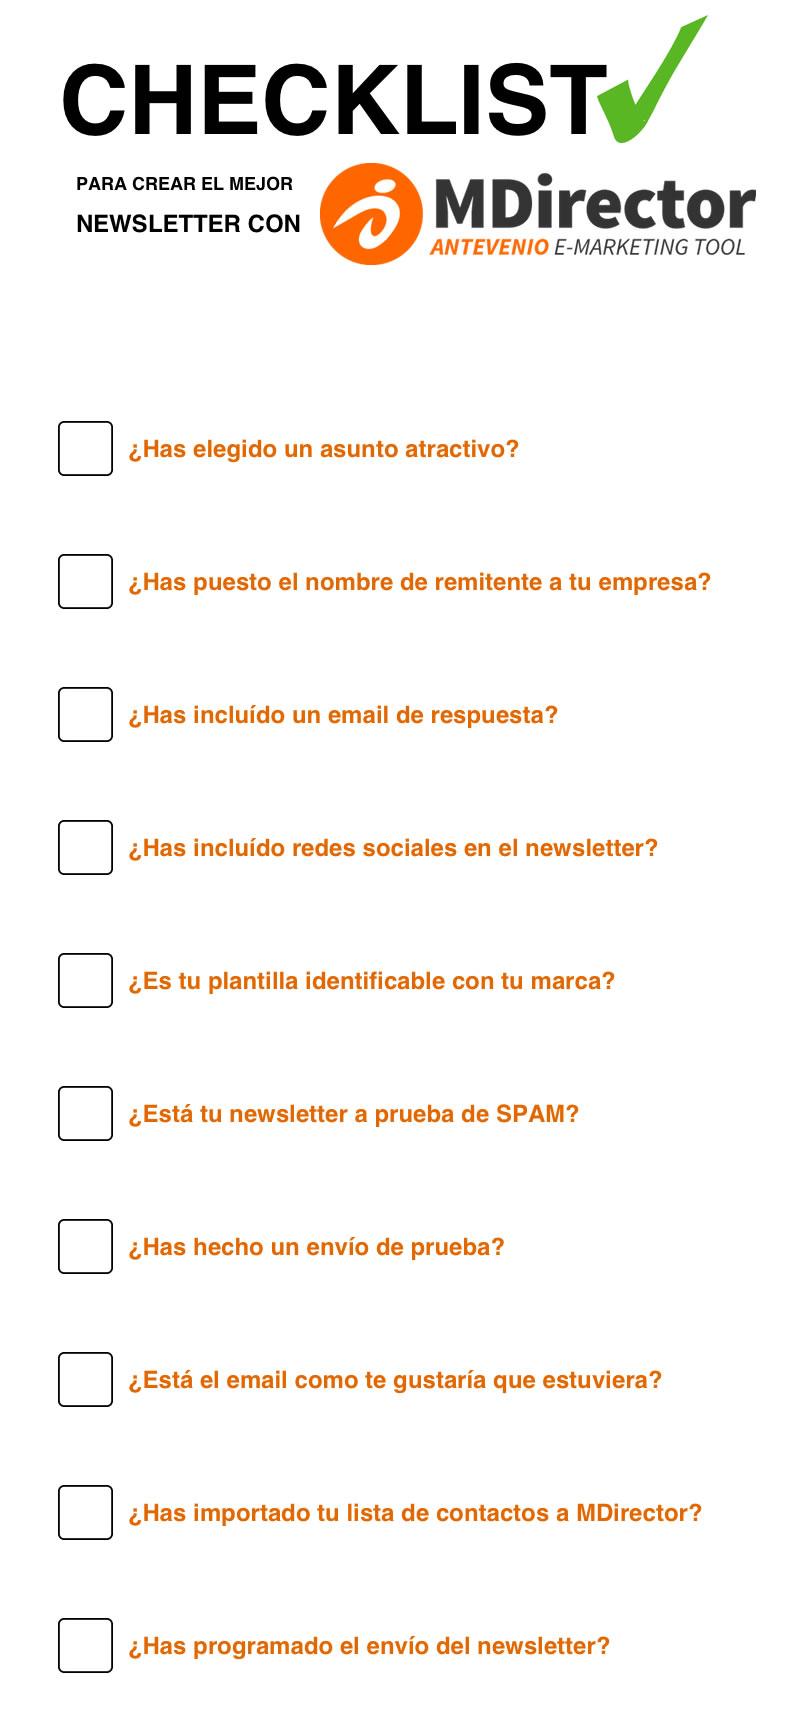 Checklist para Crear un newsletter con MDirector